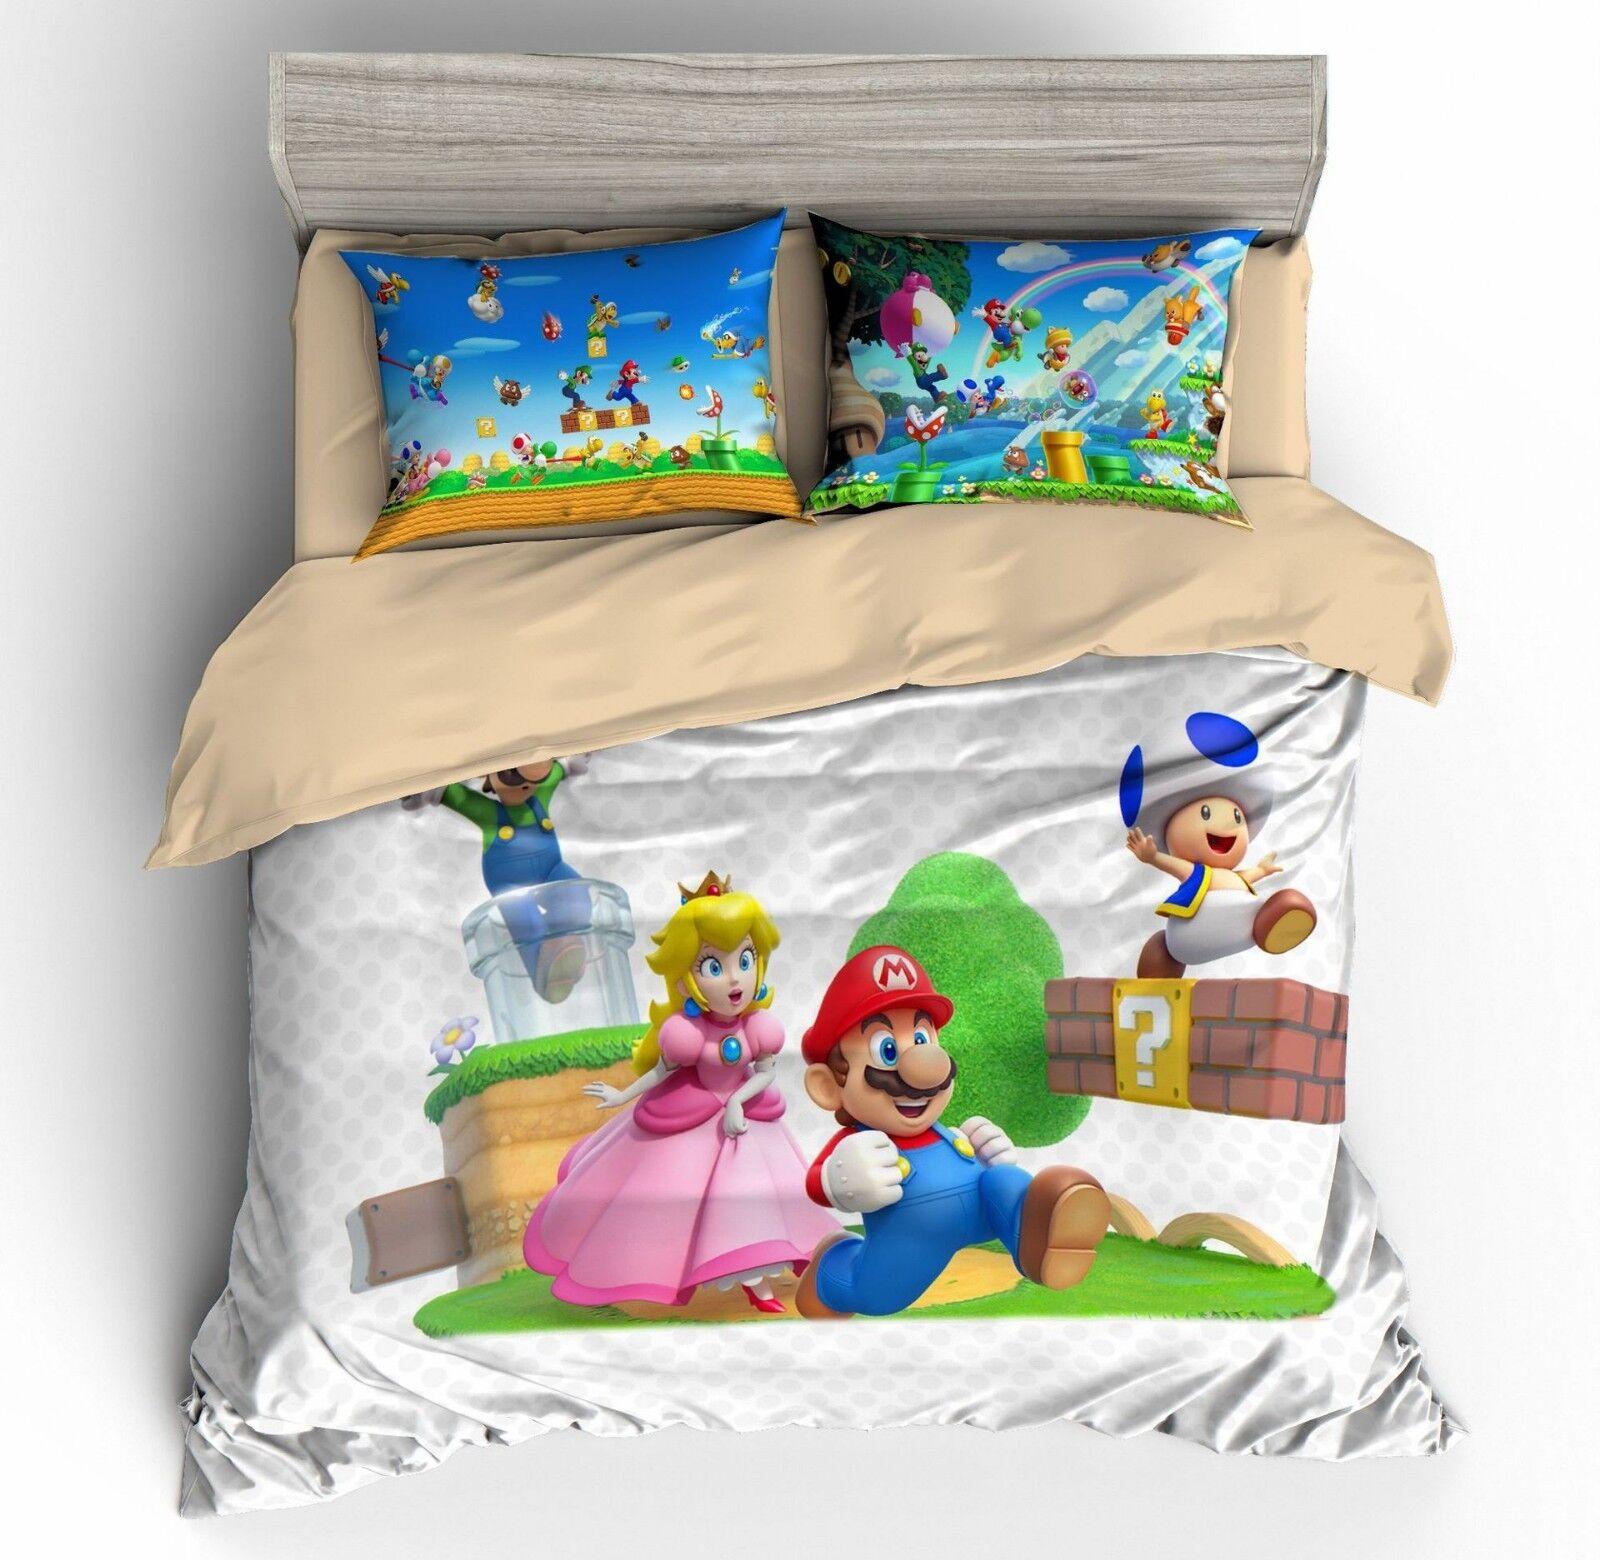 3D Super Mario Princess Peach Duvet Cover Sets Kids Soft Bedding Set Quilt Cover